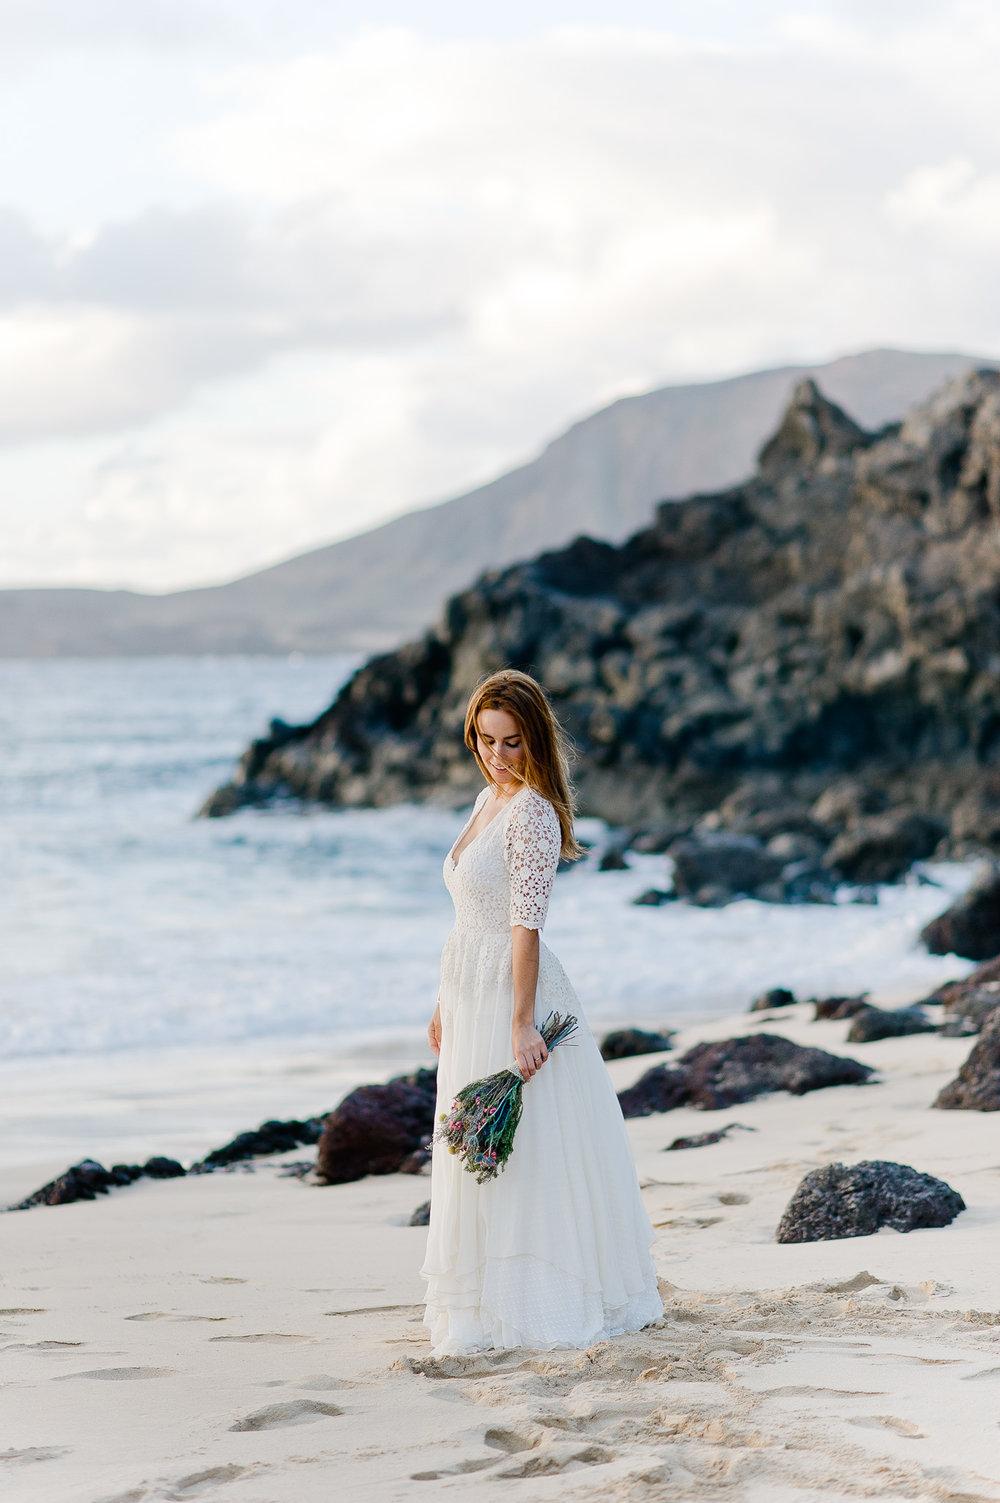 anna hari wedding photography-69.jpg